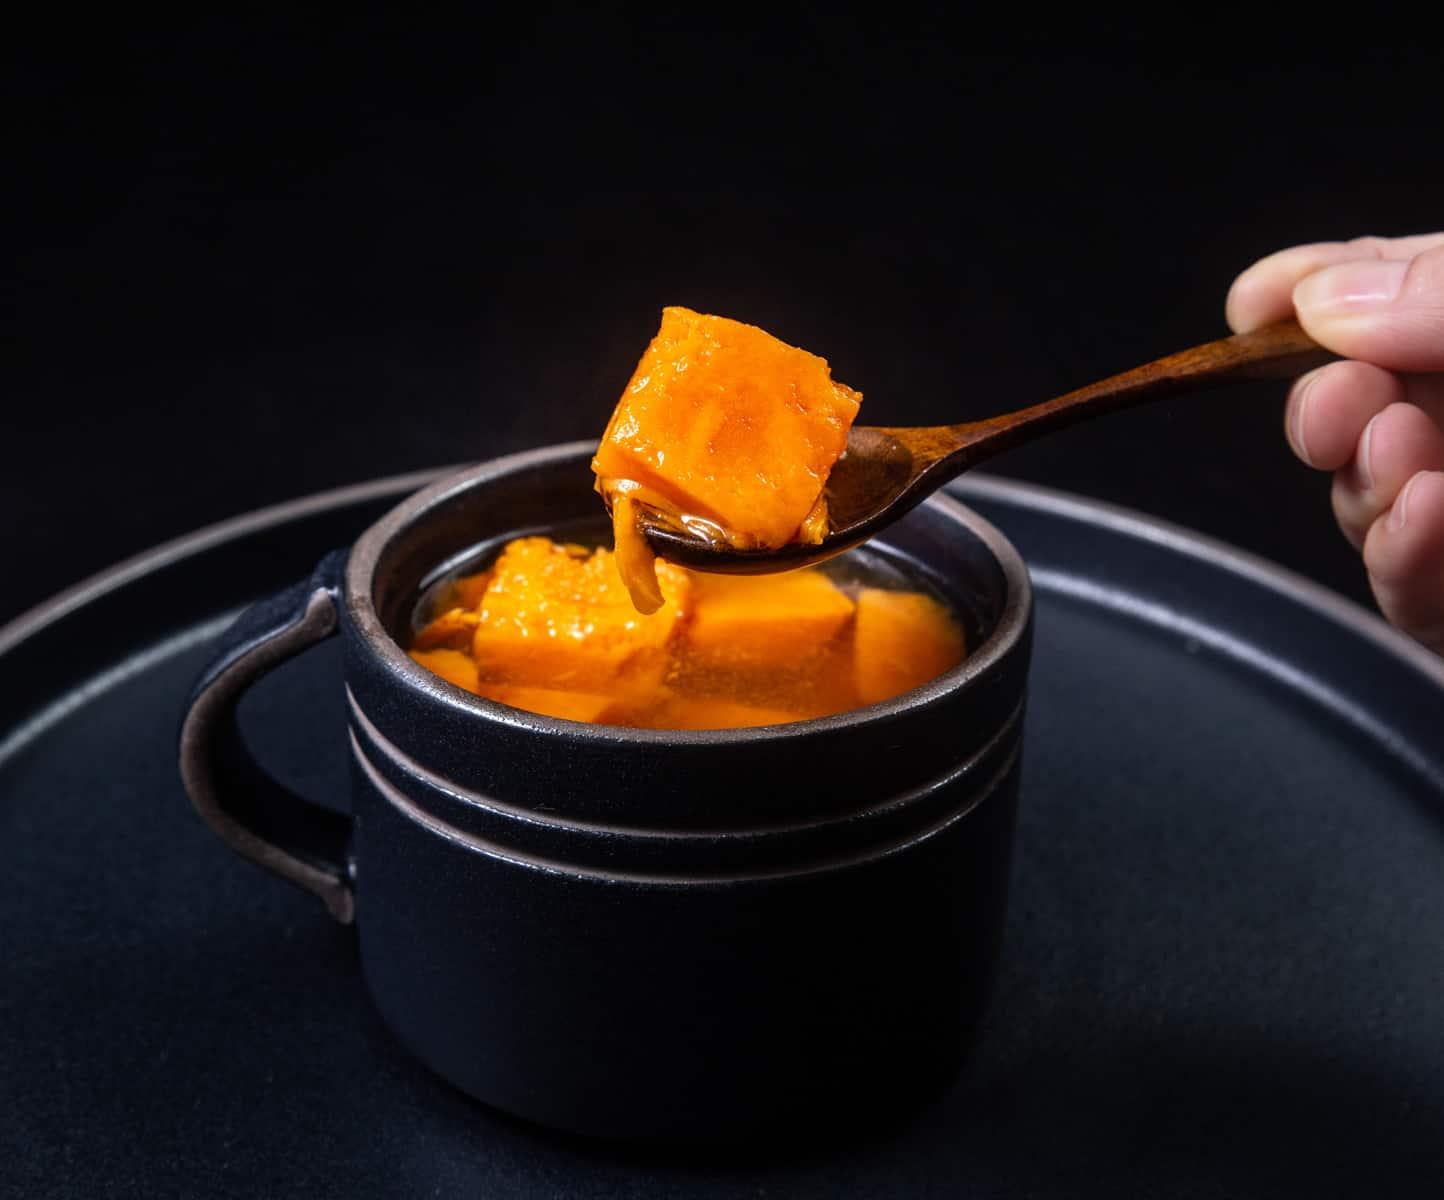 Instant Pot Chinese Sweet Potato Soup | 番薯糖水 | Pressure Cooker Chinese Sweet Potato Soup | 番薯姜糖水 | Sweet Potato Soup | Instant Pot Chinese Recipes | Instant Pot Dessert | Instant Pot Recipes | Instant Pot Soup